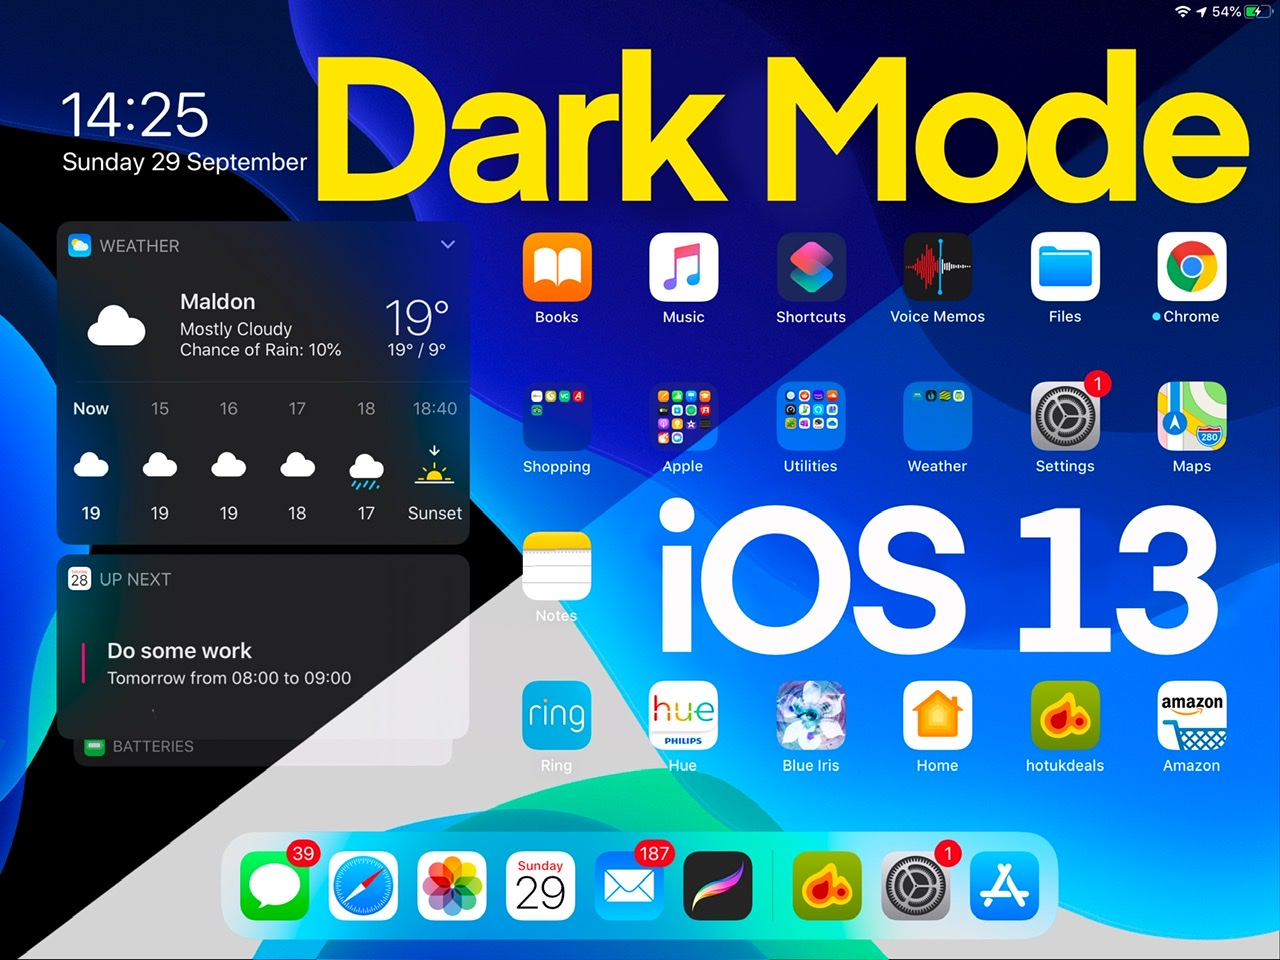 Dark Mode for iPadOS and iOS 13